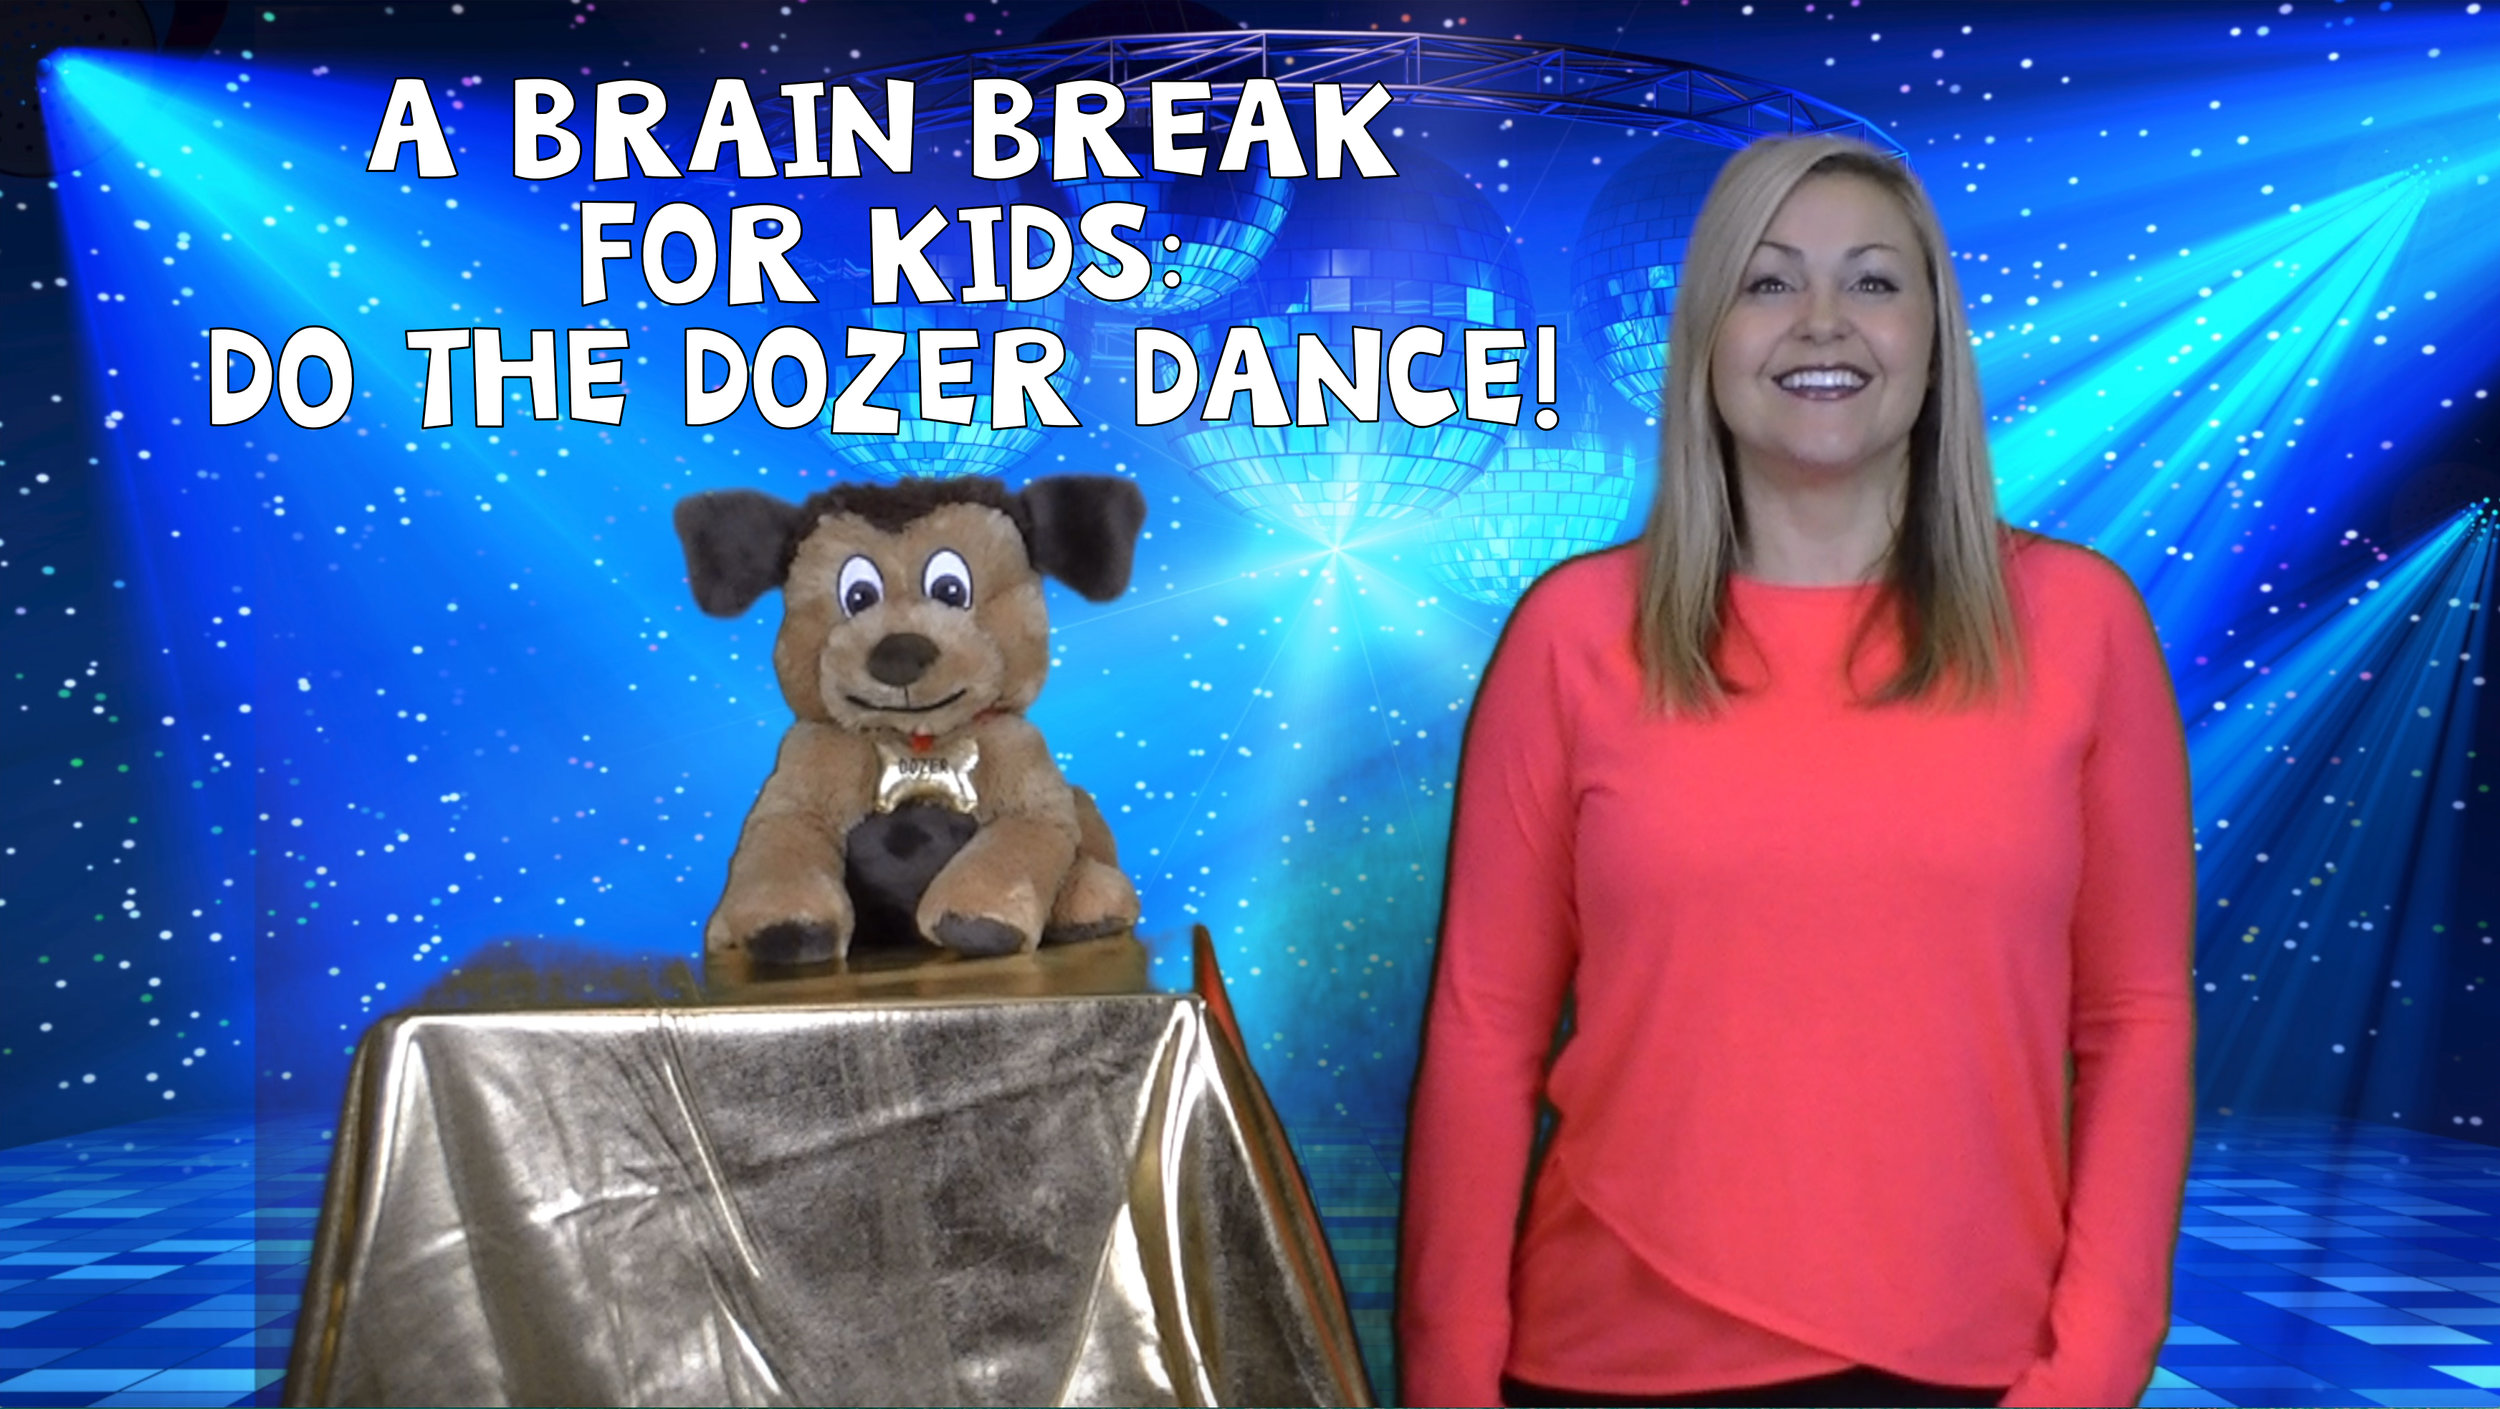 Do the Dozer Dance with Dr. Lori!